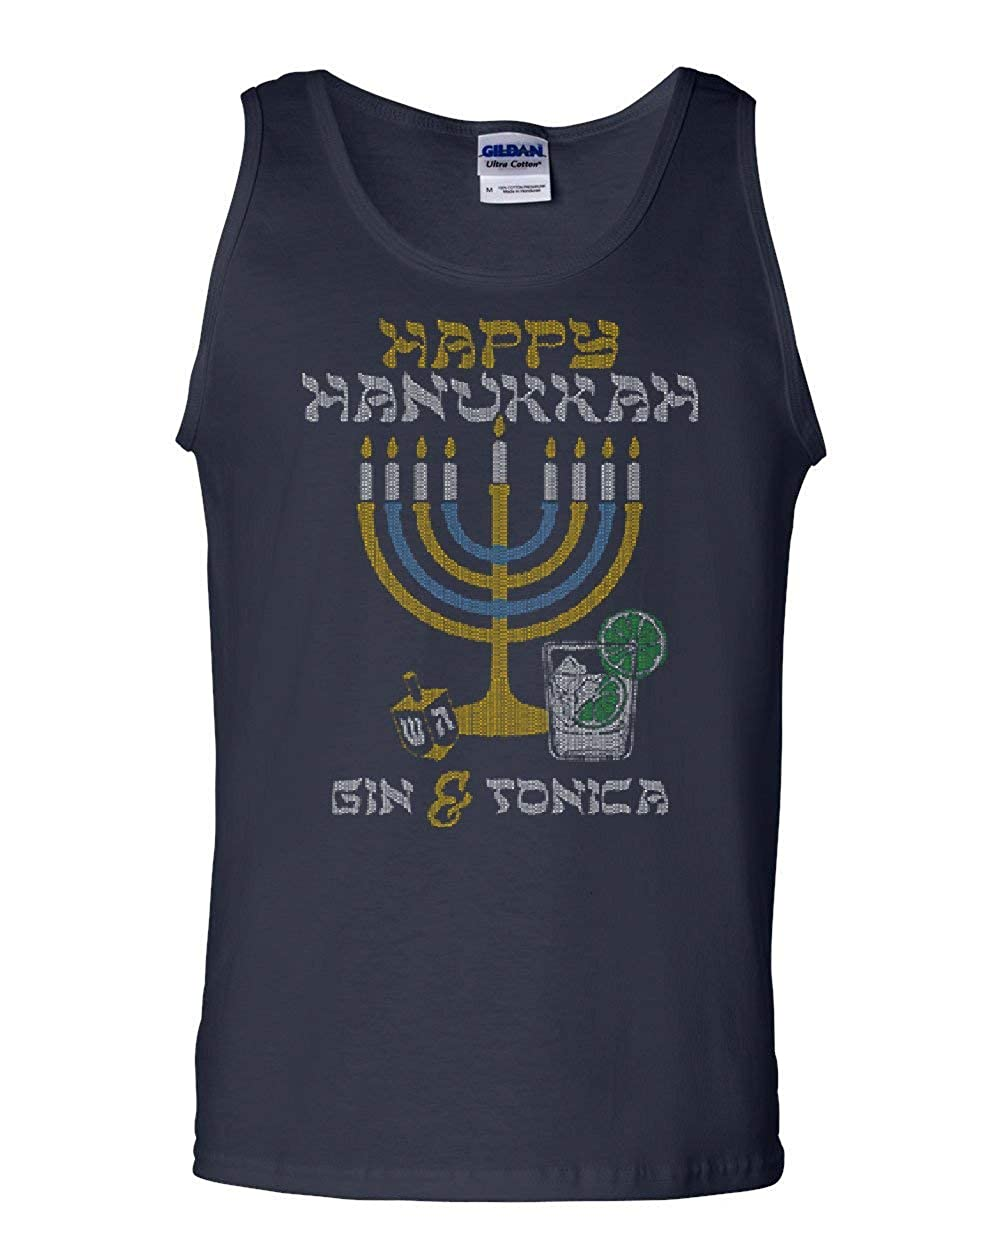 Tee Hunt Happy Hanukkah Tank Top Menorah Drinking Gin /& Tonica Dreidel Sleeveless